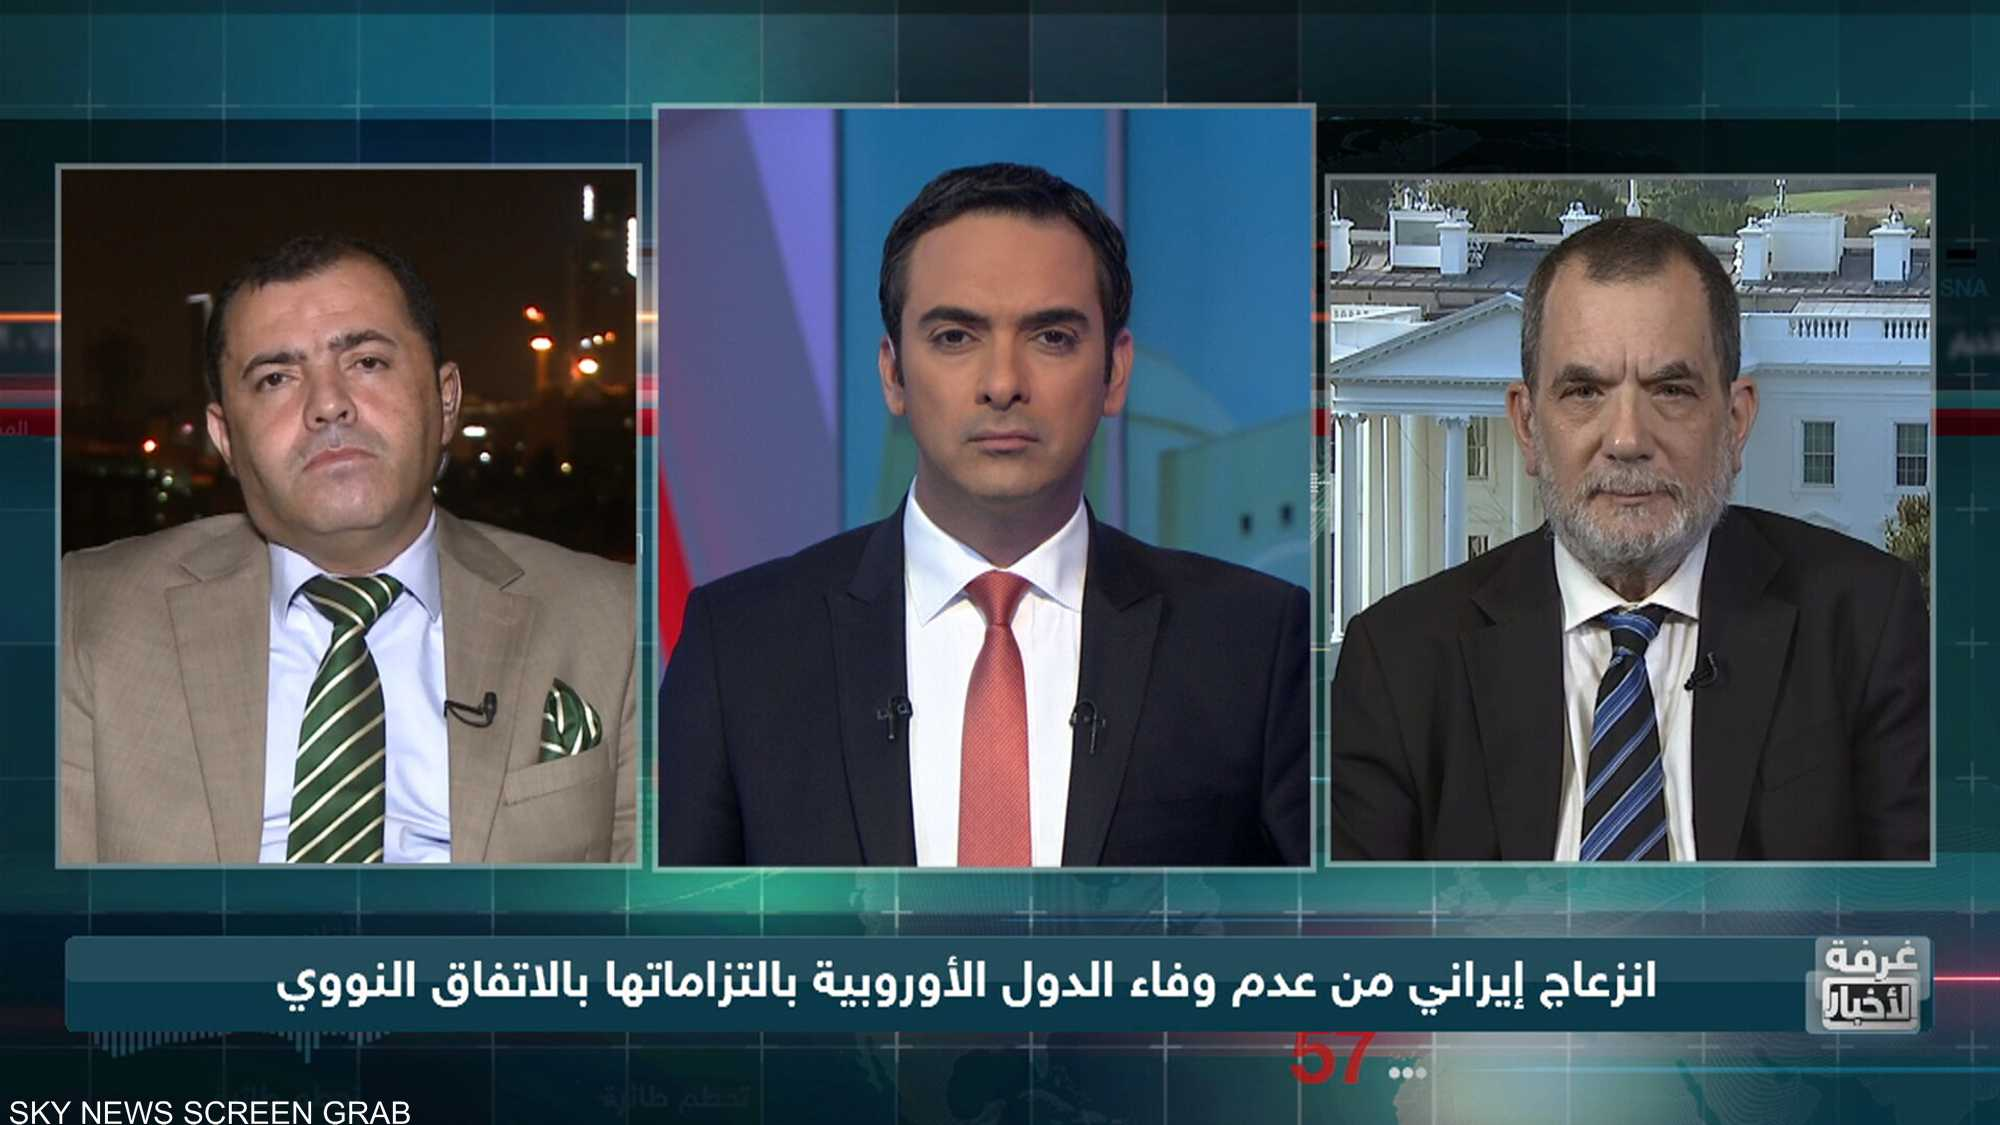 واشنطن تتوعد مشتري النفط من طهران